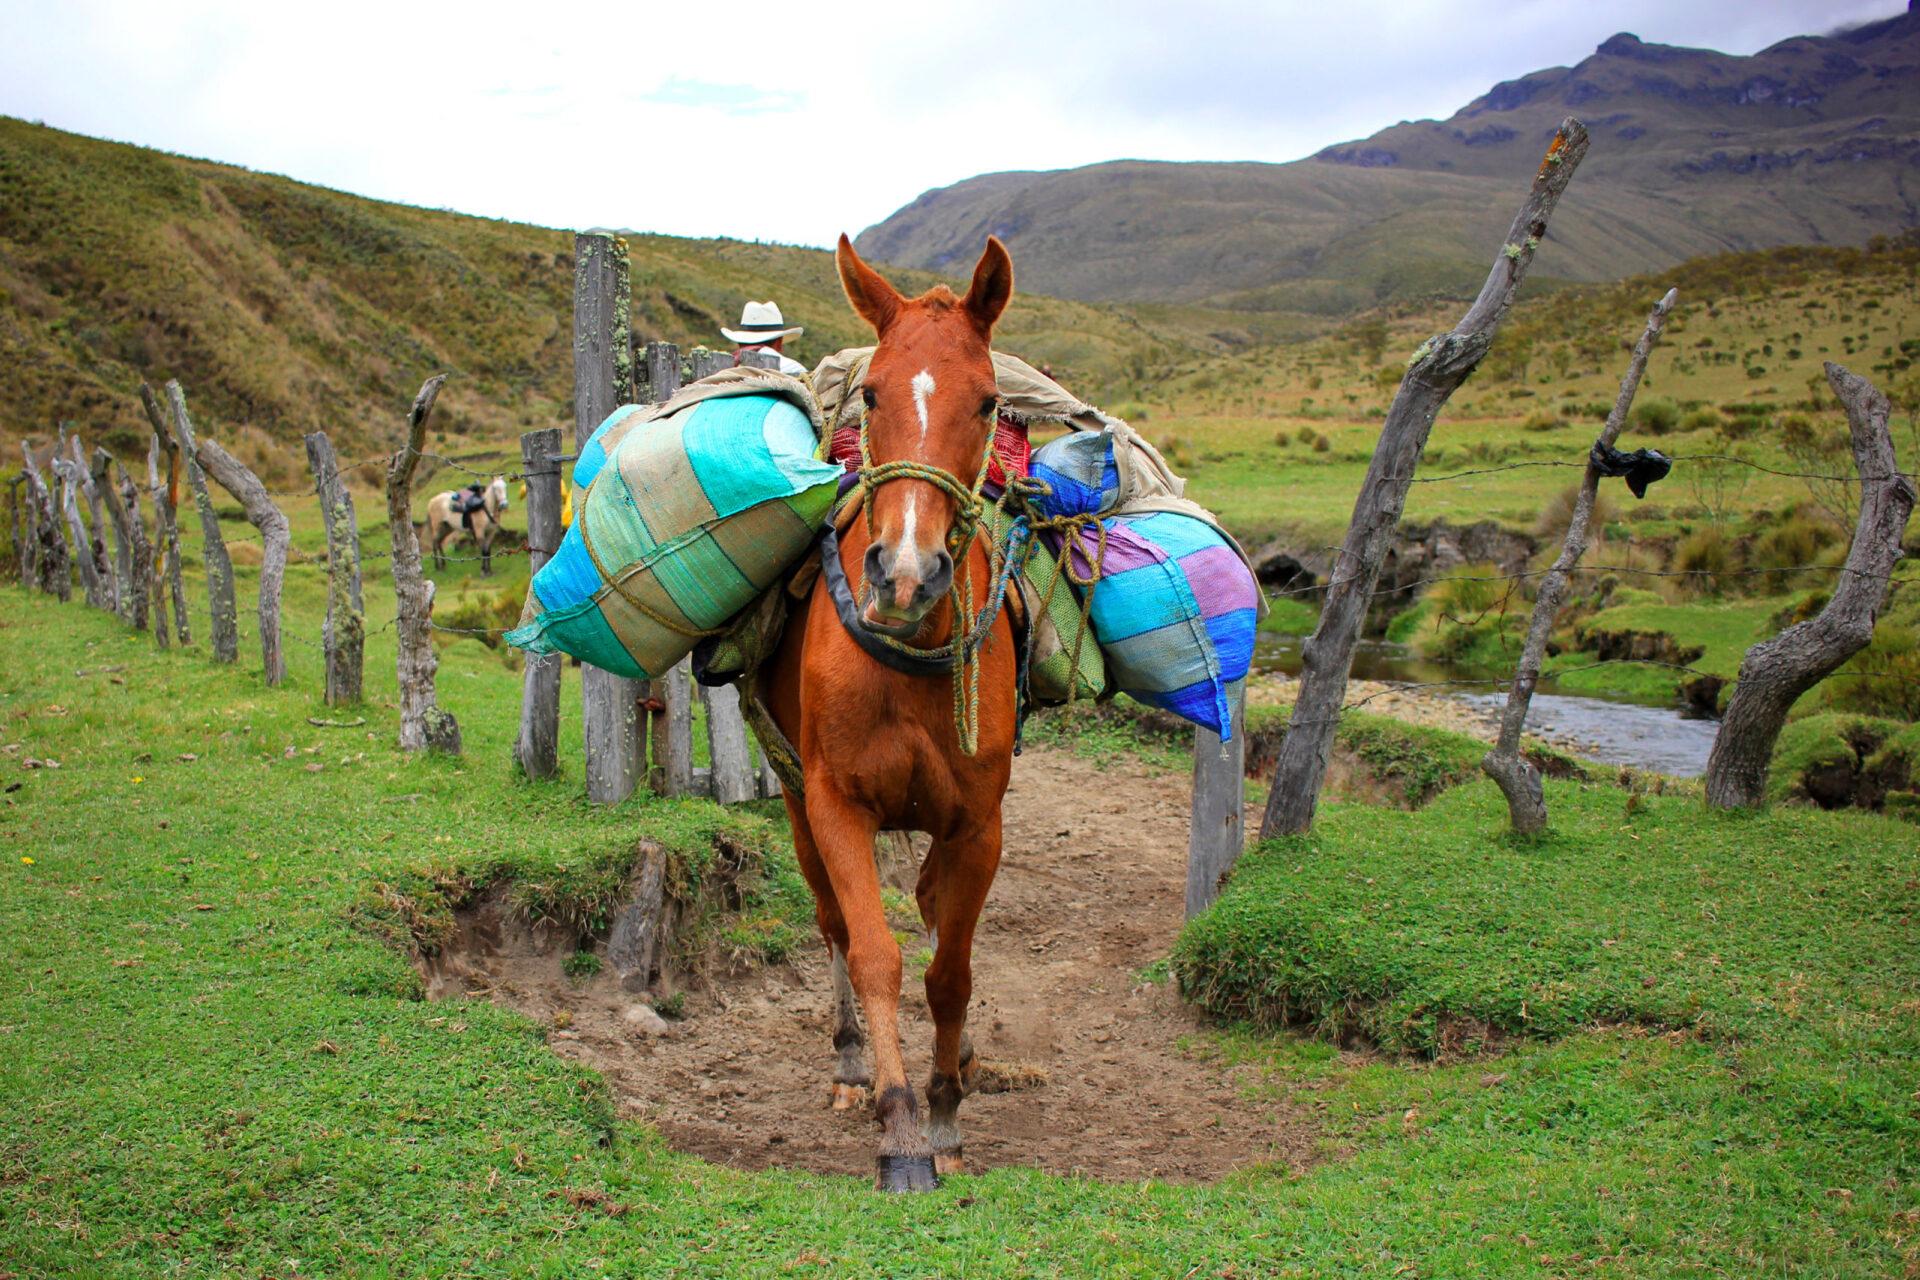 Поход понациональному парку Лос-Невадос. Колумбия